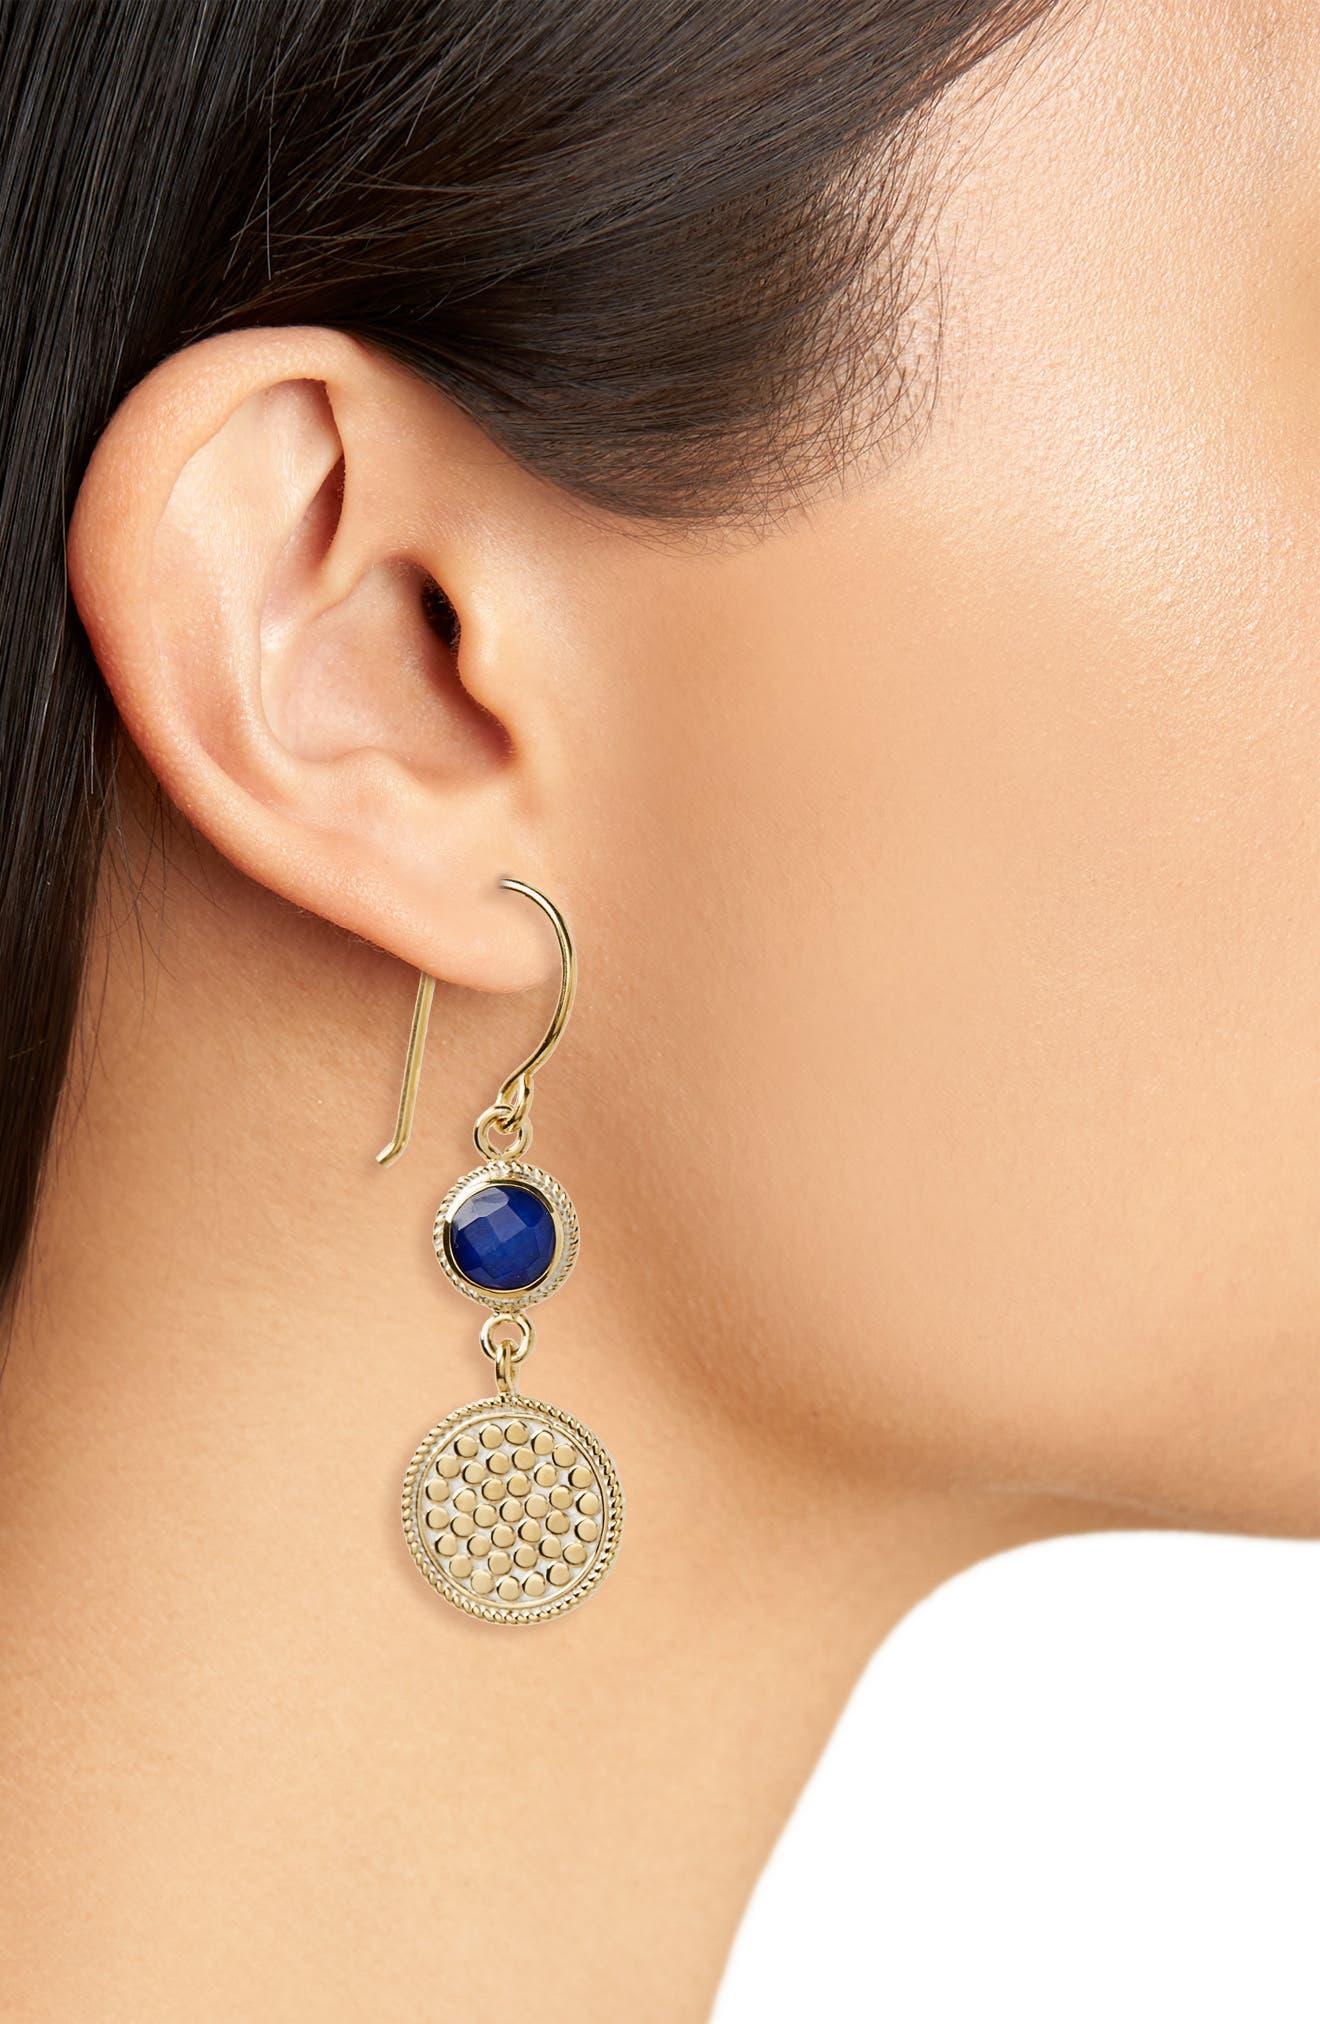 Semiprecious Stone Double Drop Earrings,                             Alternate thumbnail 2, color,                             BLUE LAPIS